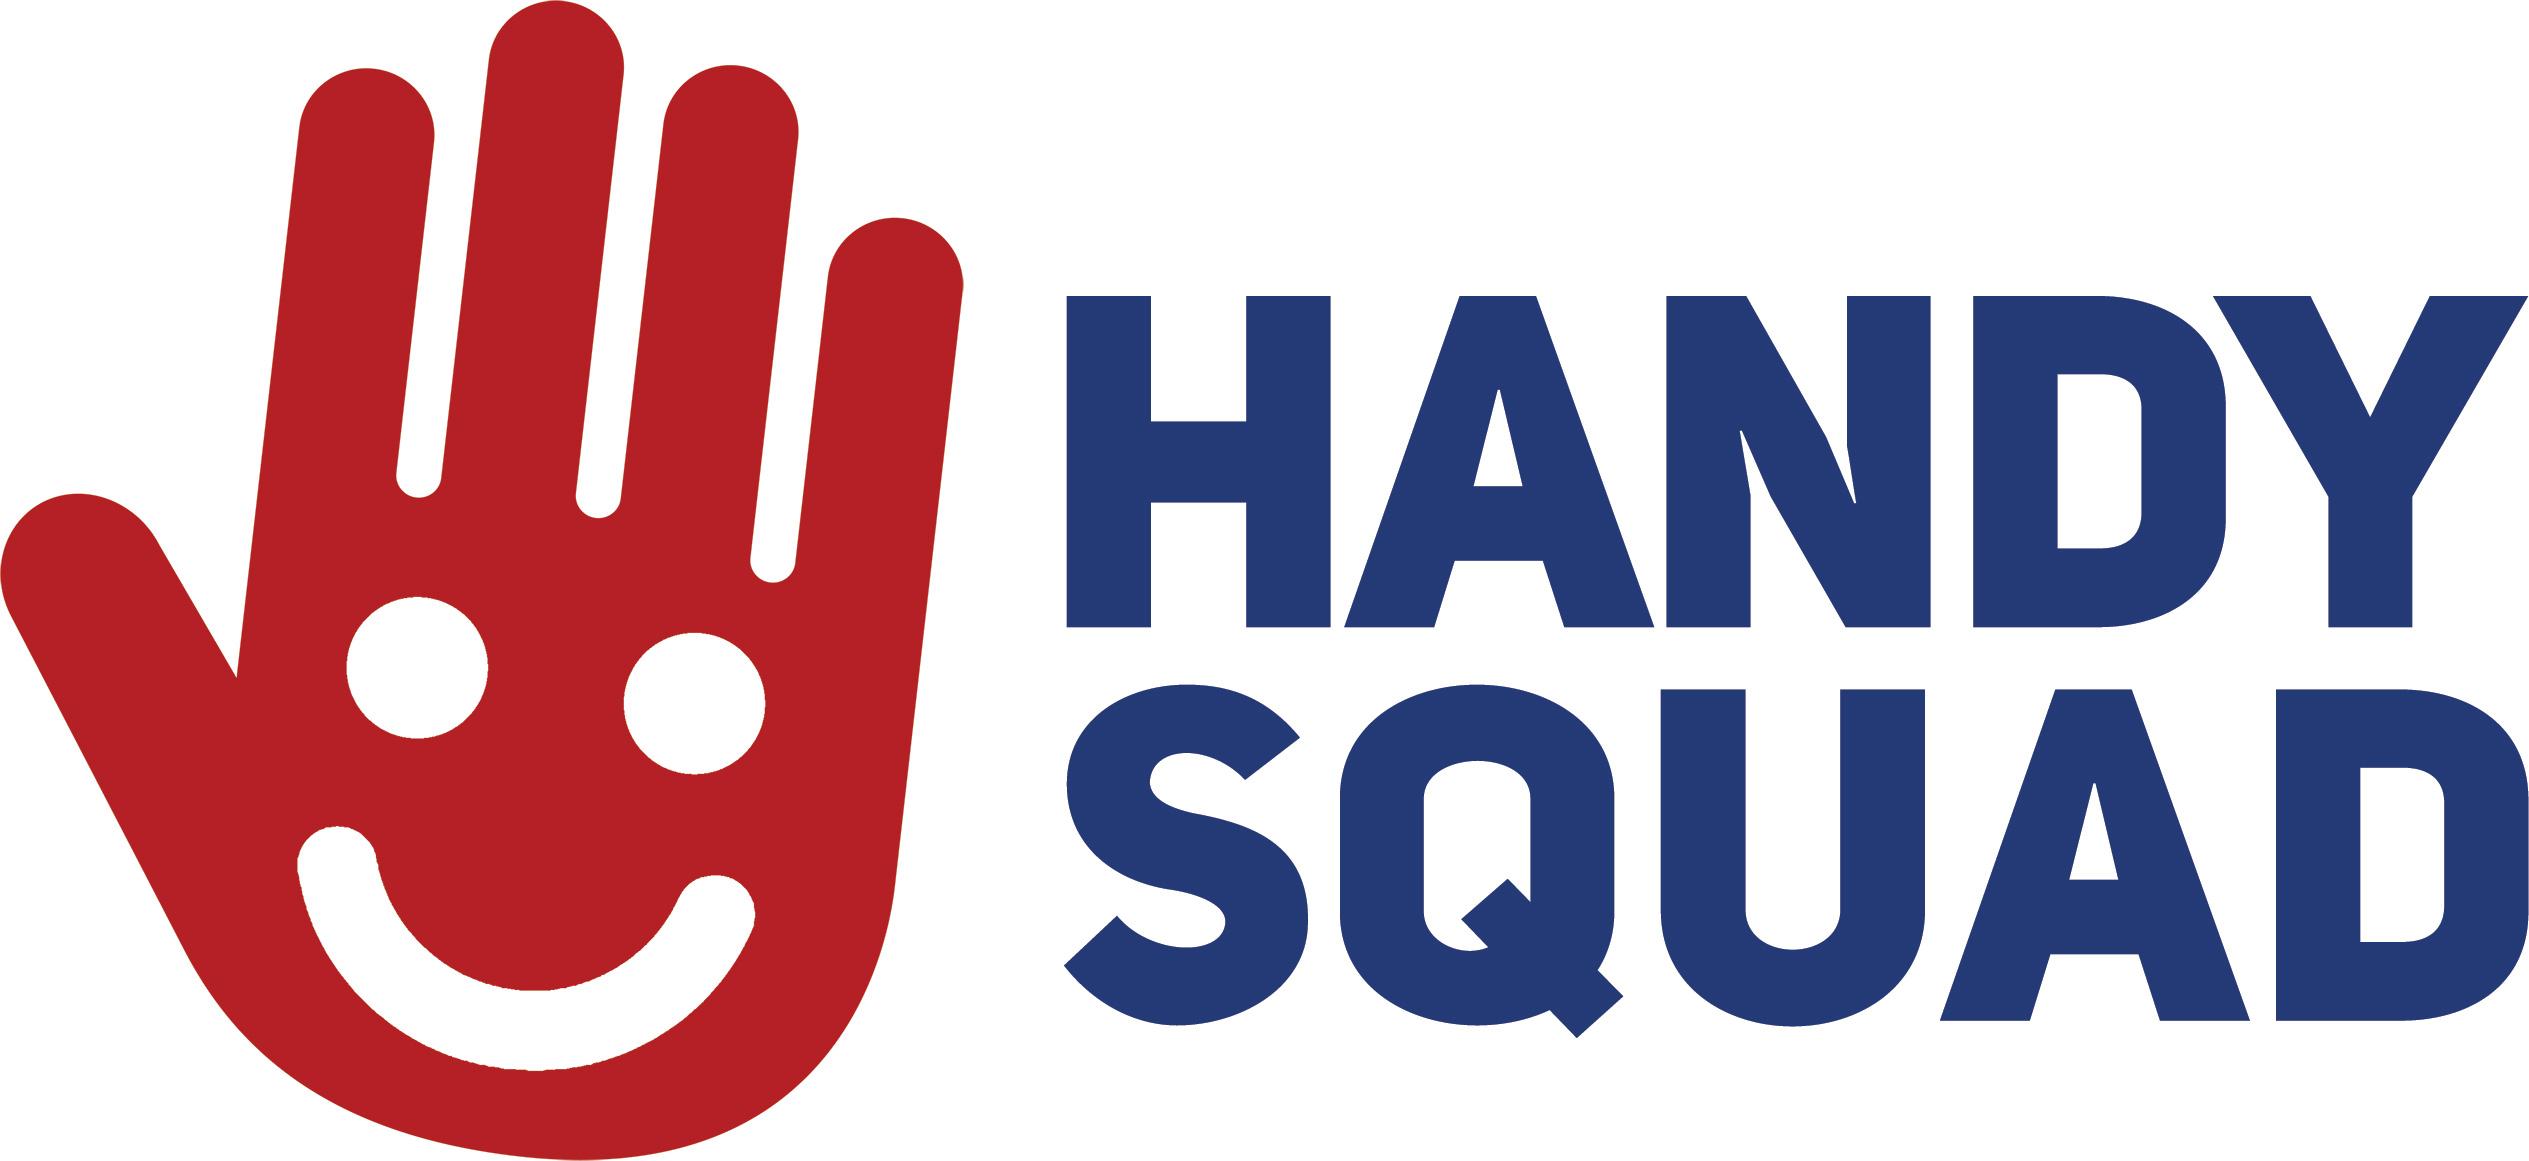 Handy Logos